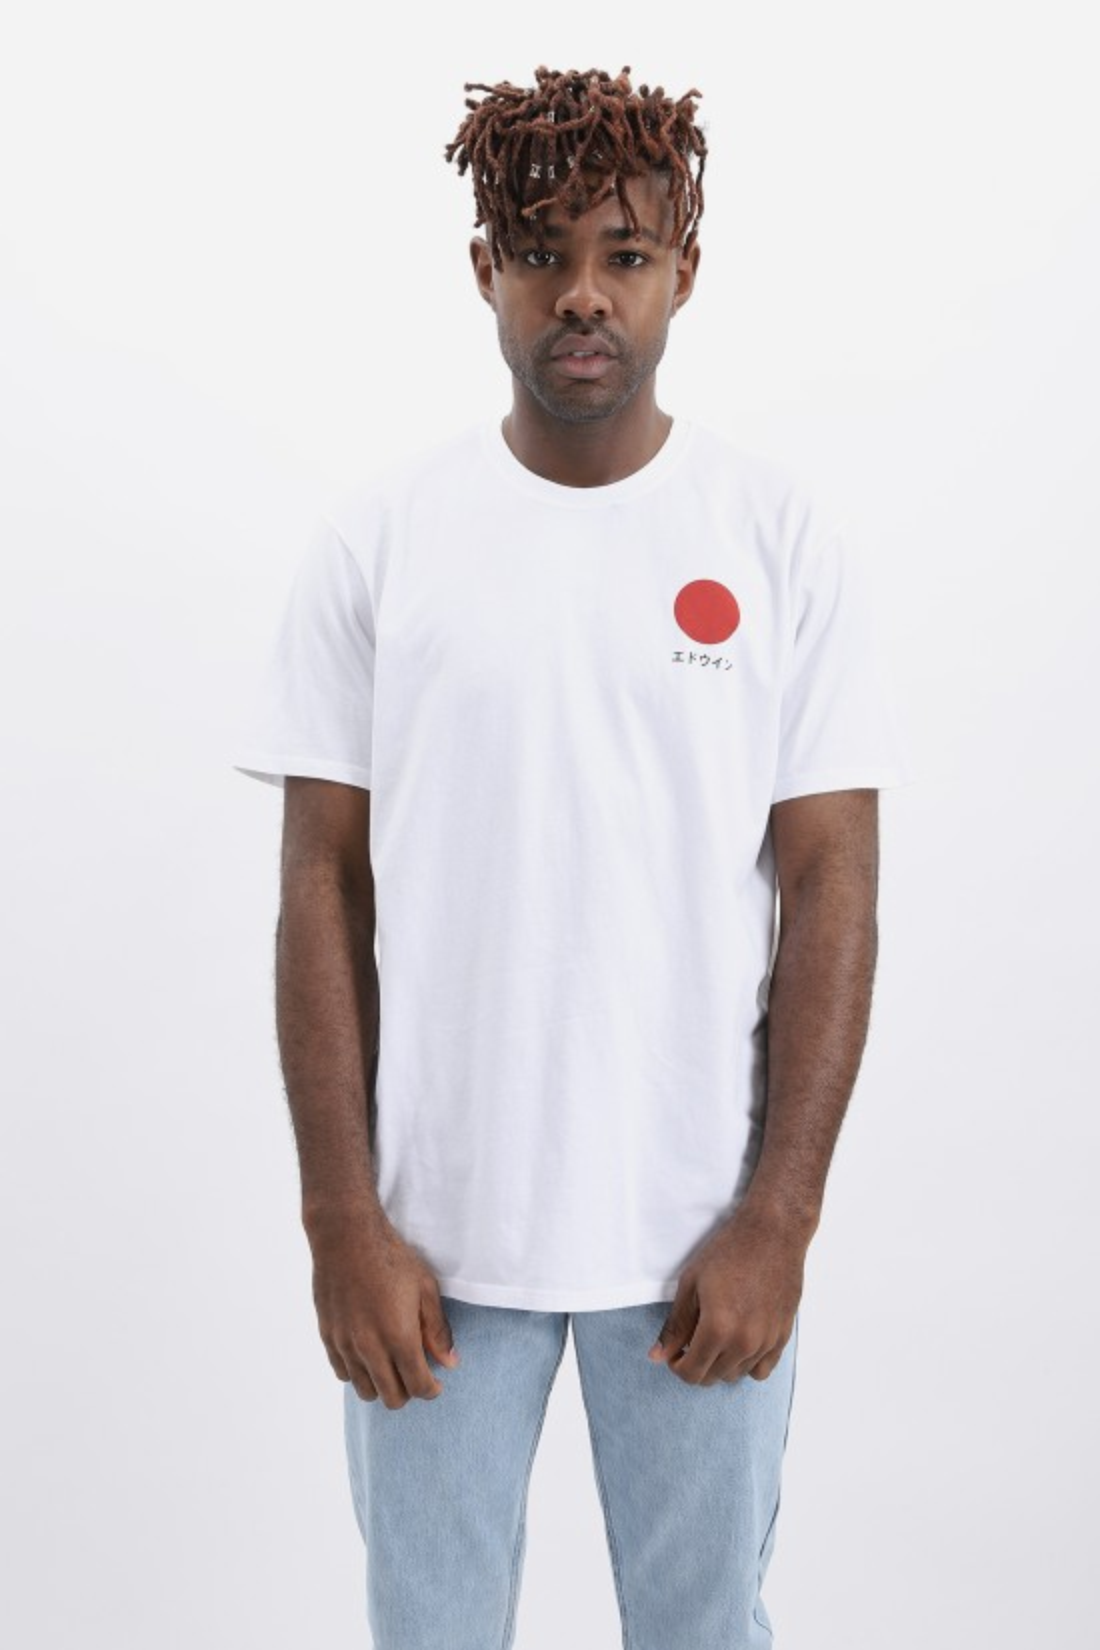 EDWIN / Japanese sun tshirt White